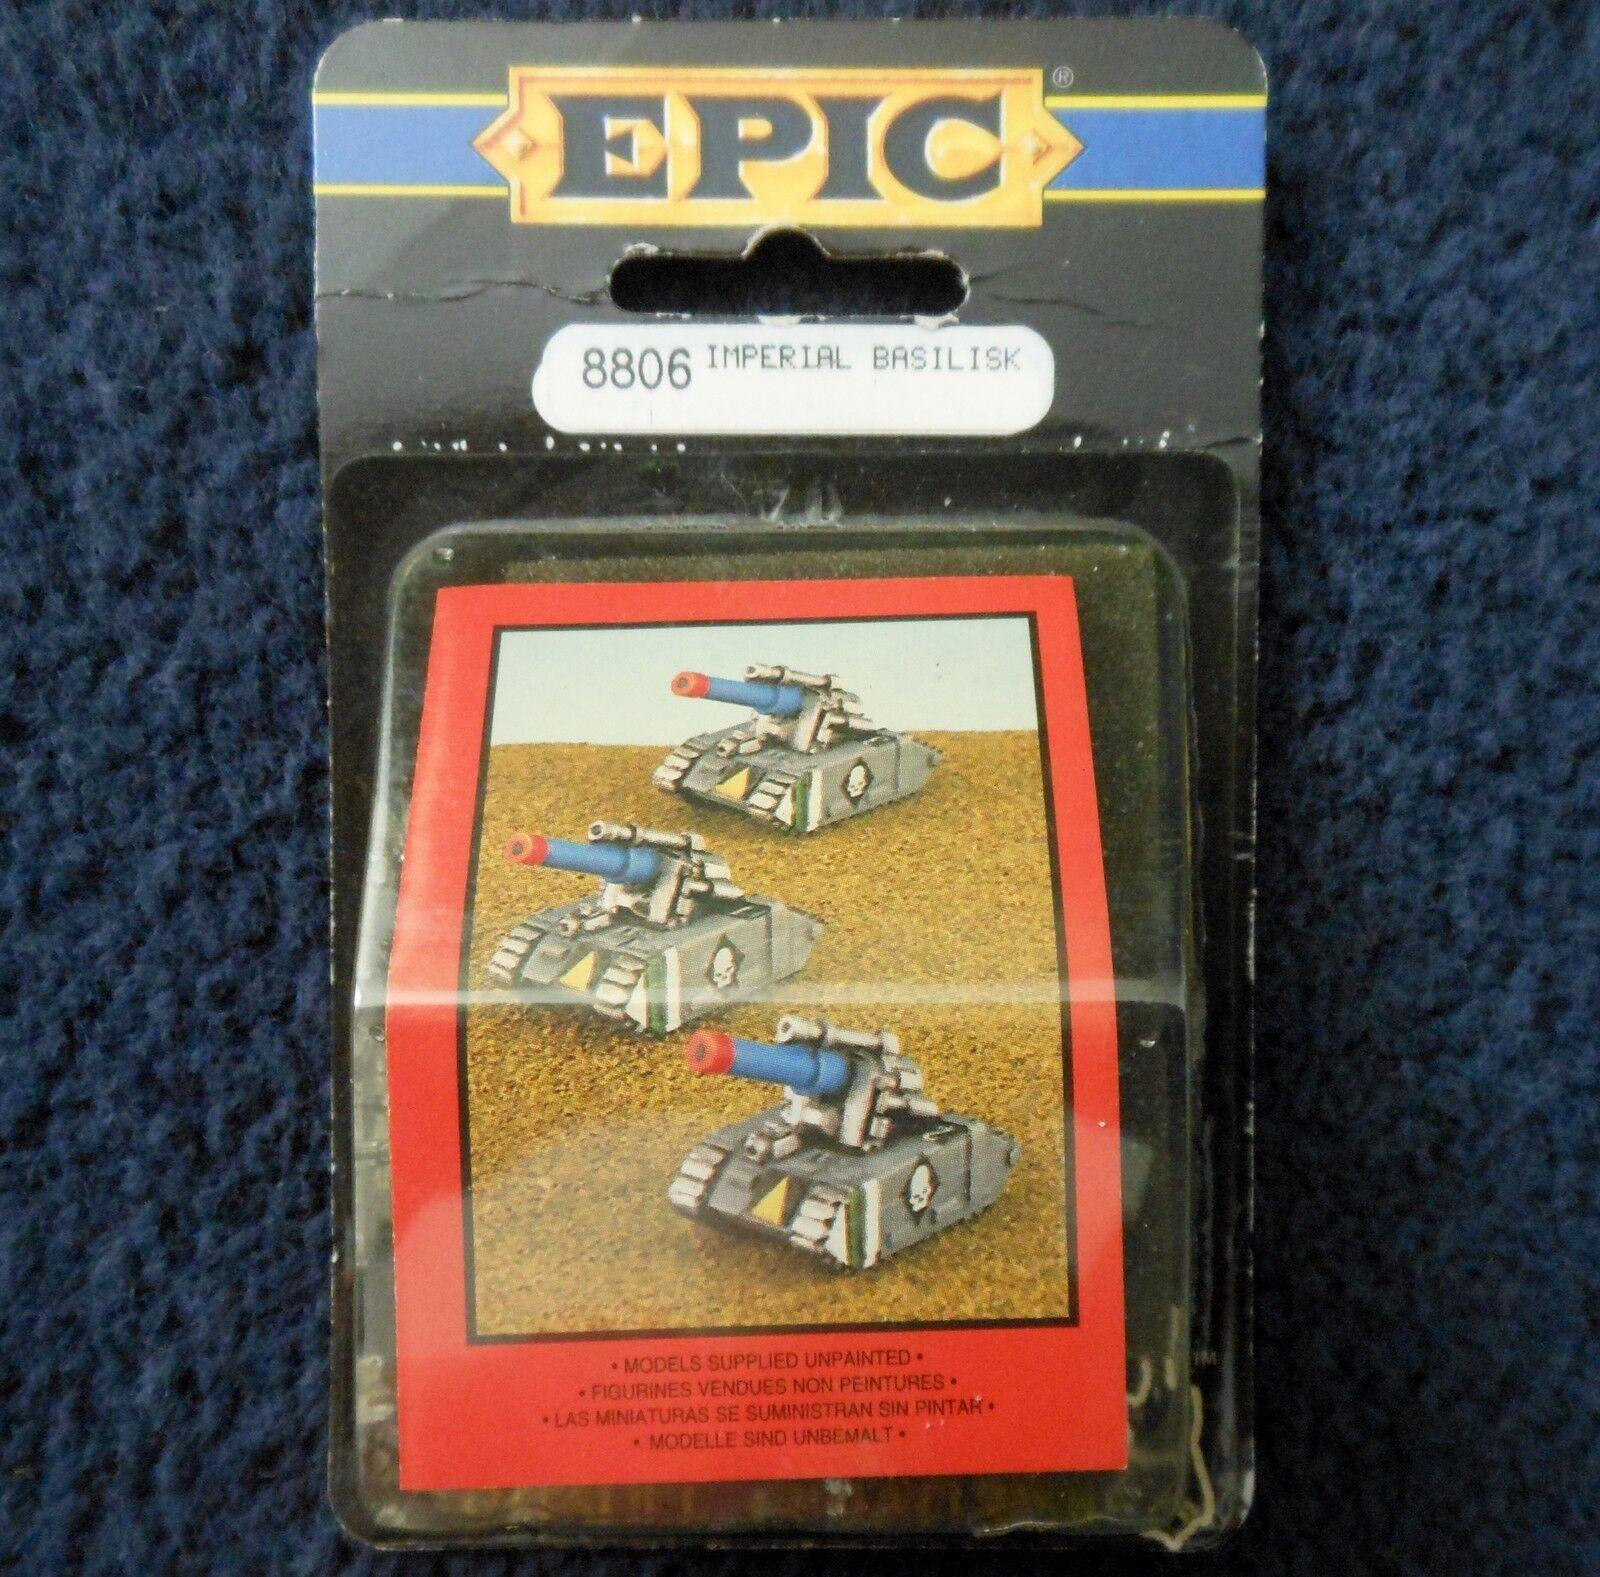 1991 Epic Imperial Guard Basilisk Self Propelled Gun Citadel 6mm 40K Army MIB GW